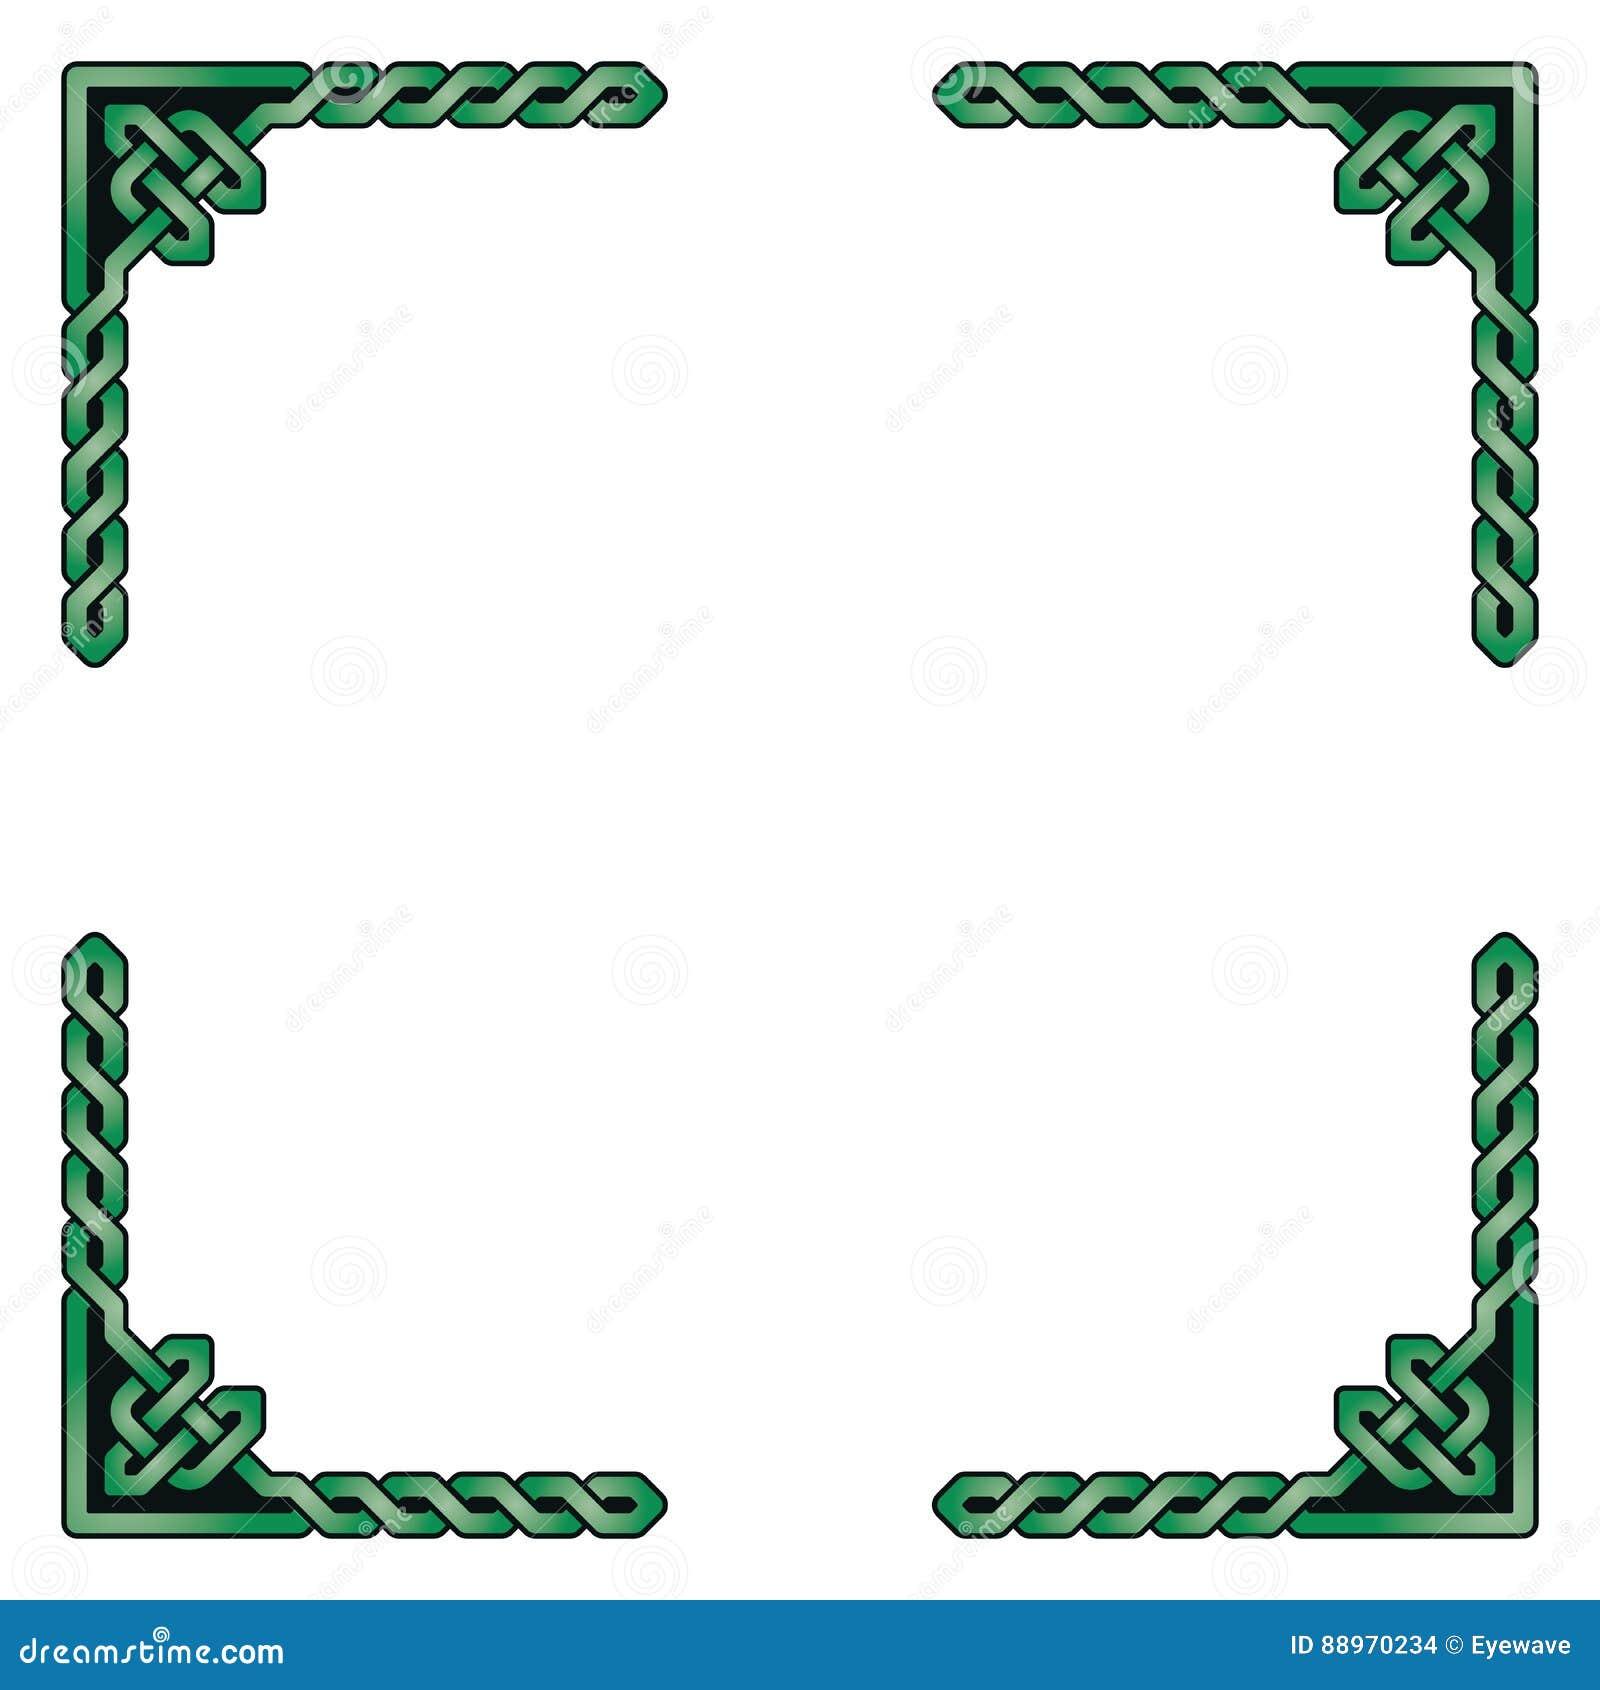 Traditionelle Dekorative Keltische Rahmen-Vektor-Illustration Vektor ...